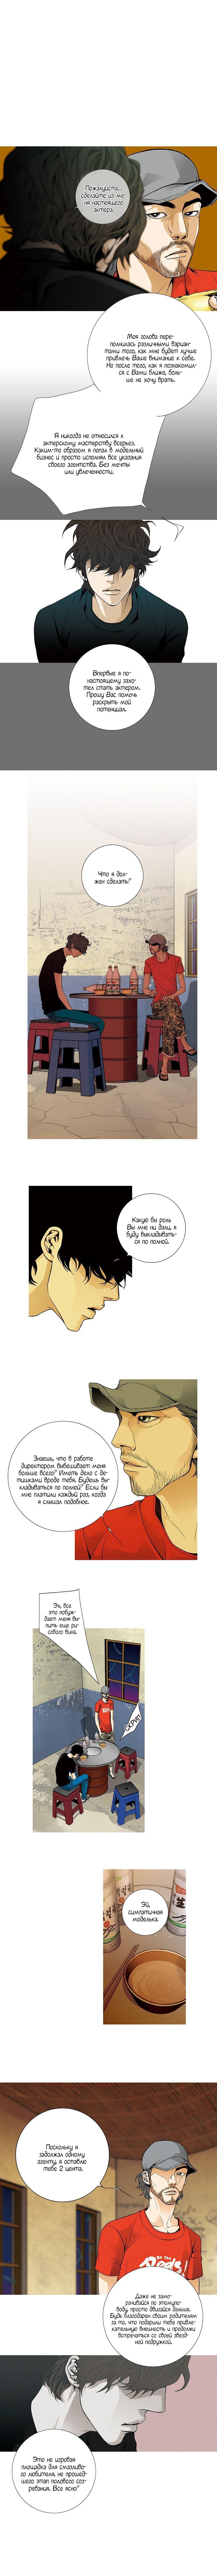 https://r1.ninemanga.com/comics/pic2/29/28573/344319/1512078265657.jpg Page 3